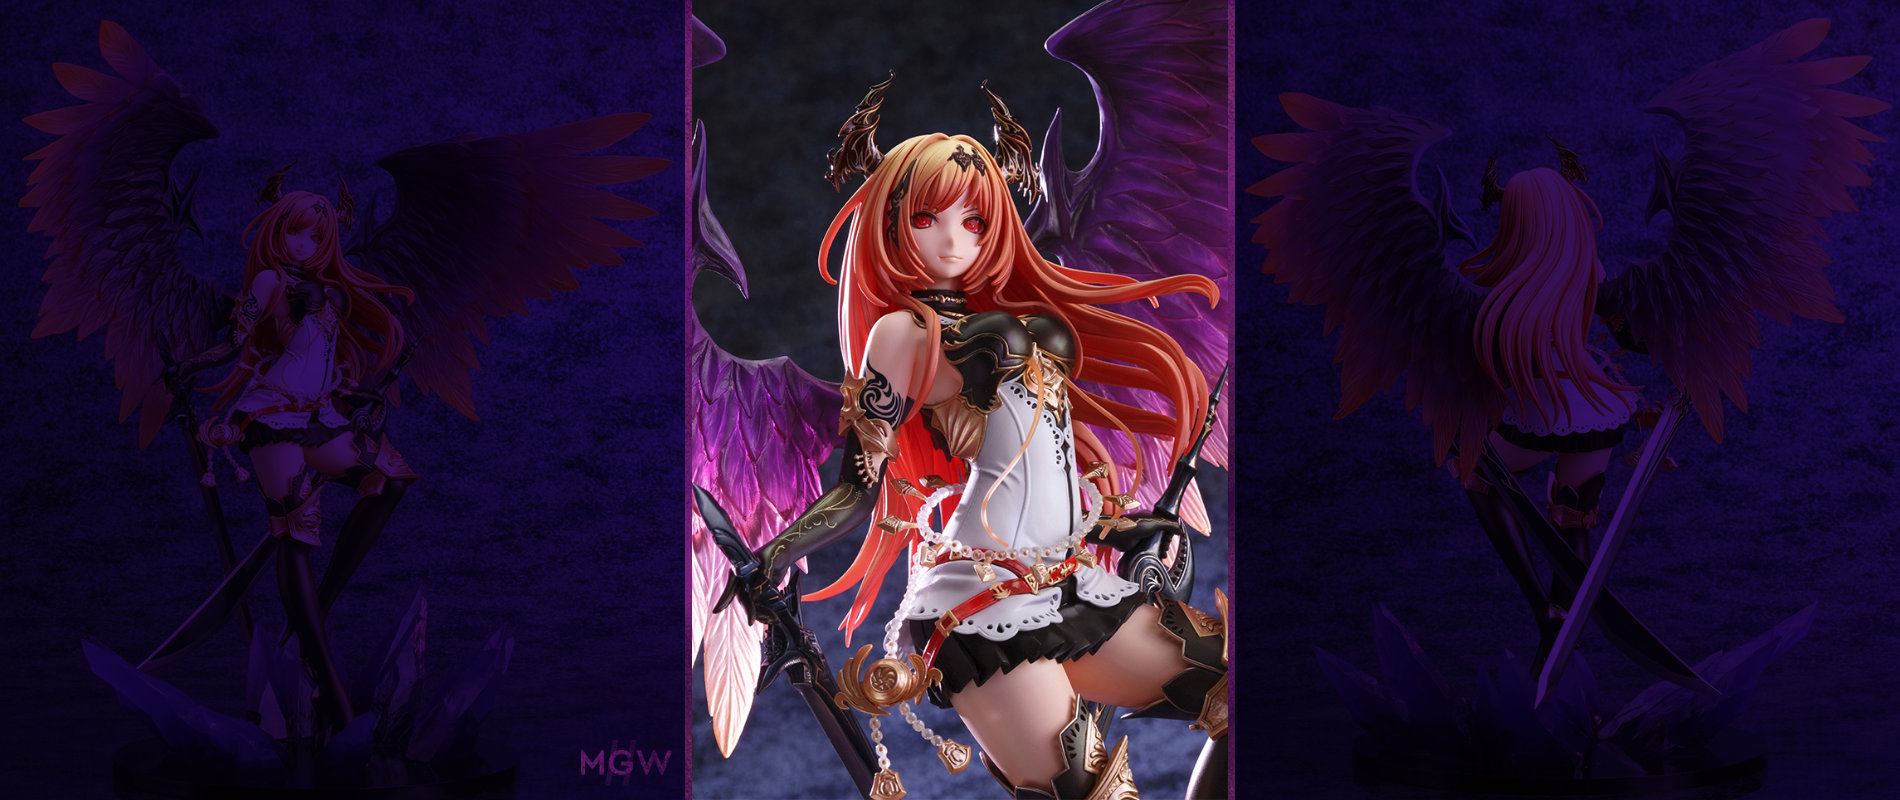 Dark Angel Olivia Renewal Package ver. by Kotobukiya from Rage of Bahamut MyGrailWatch